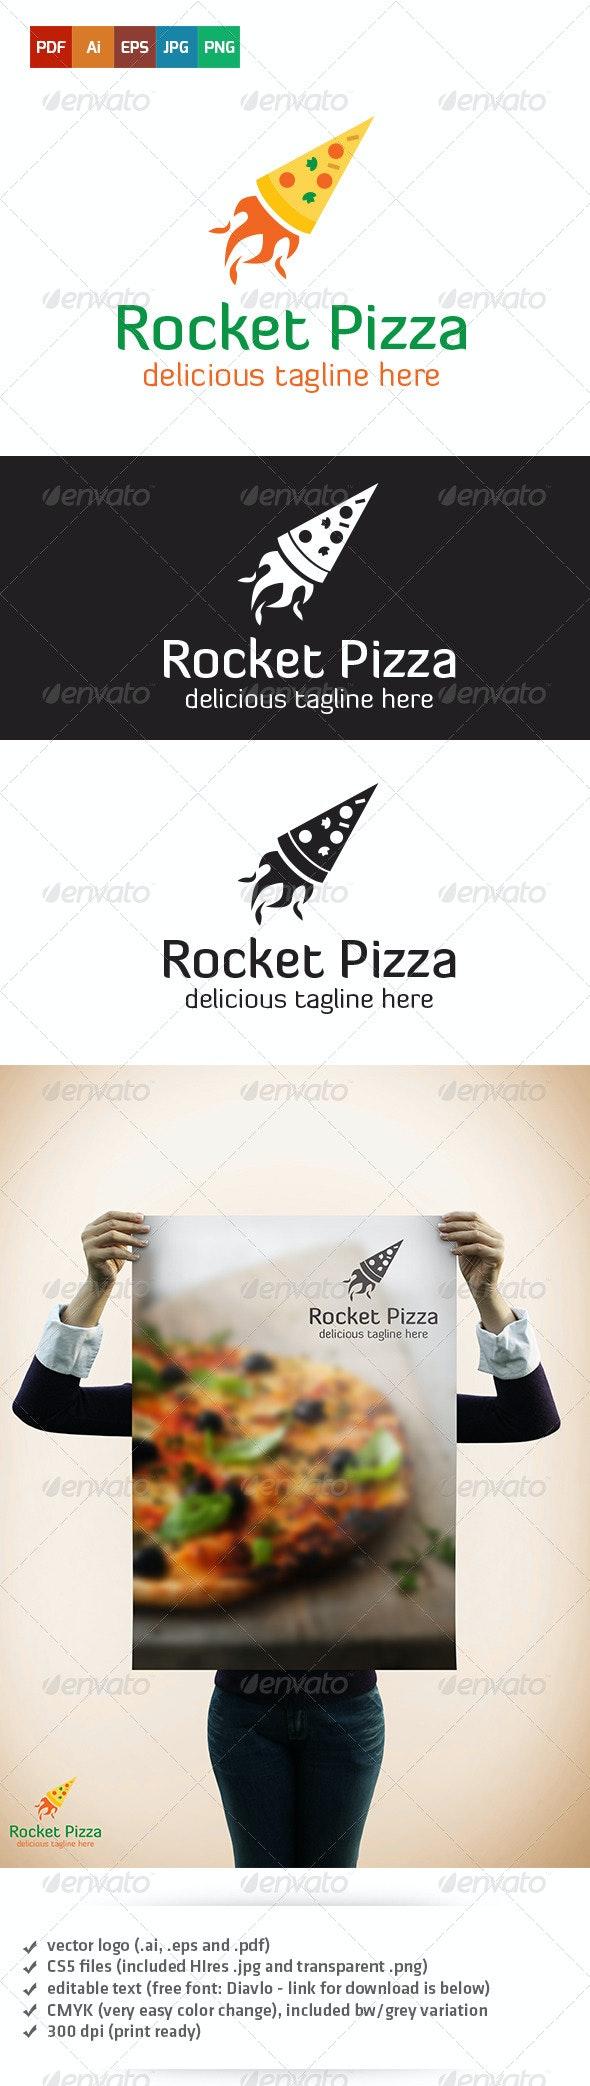 Rocket Pizza Logo